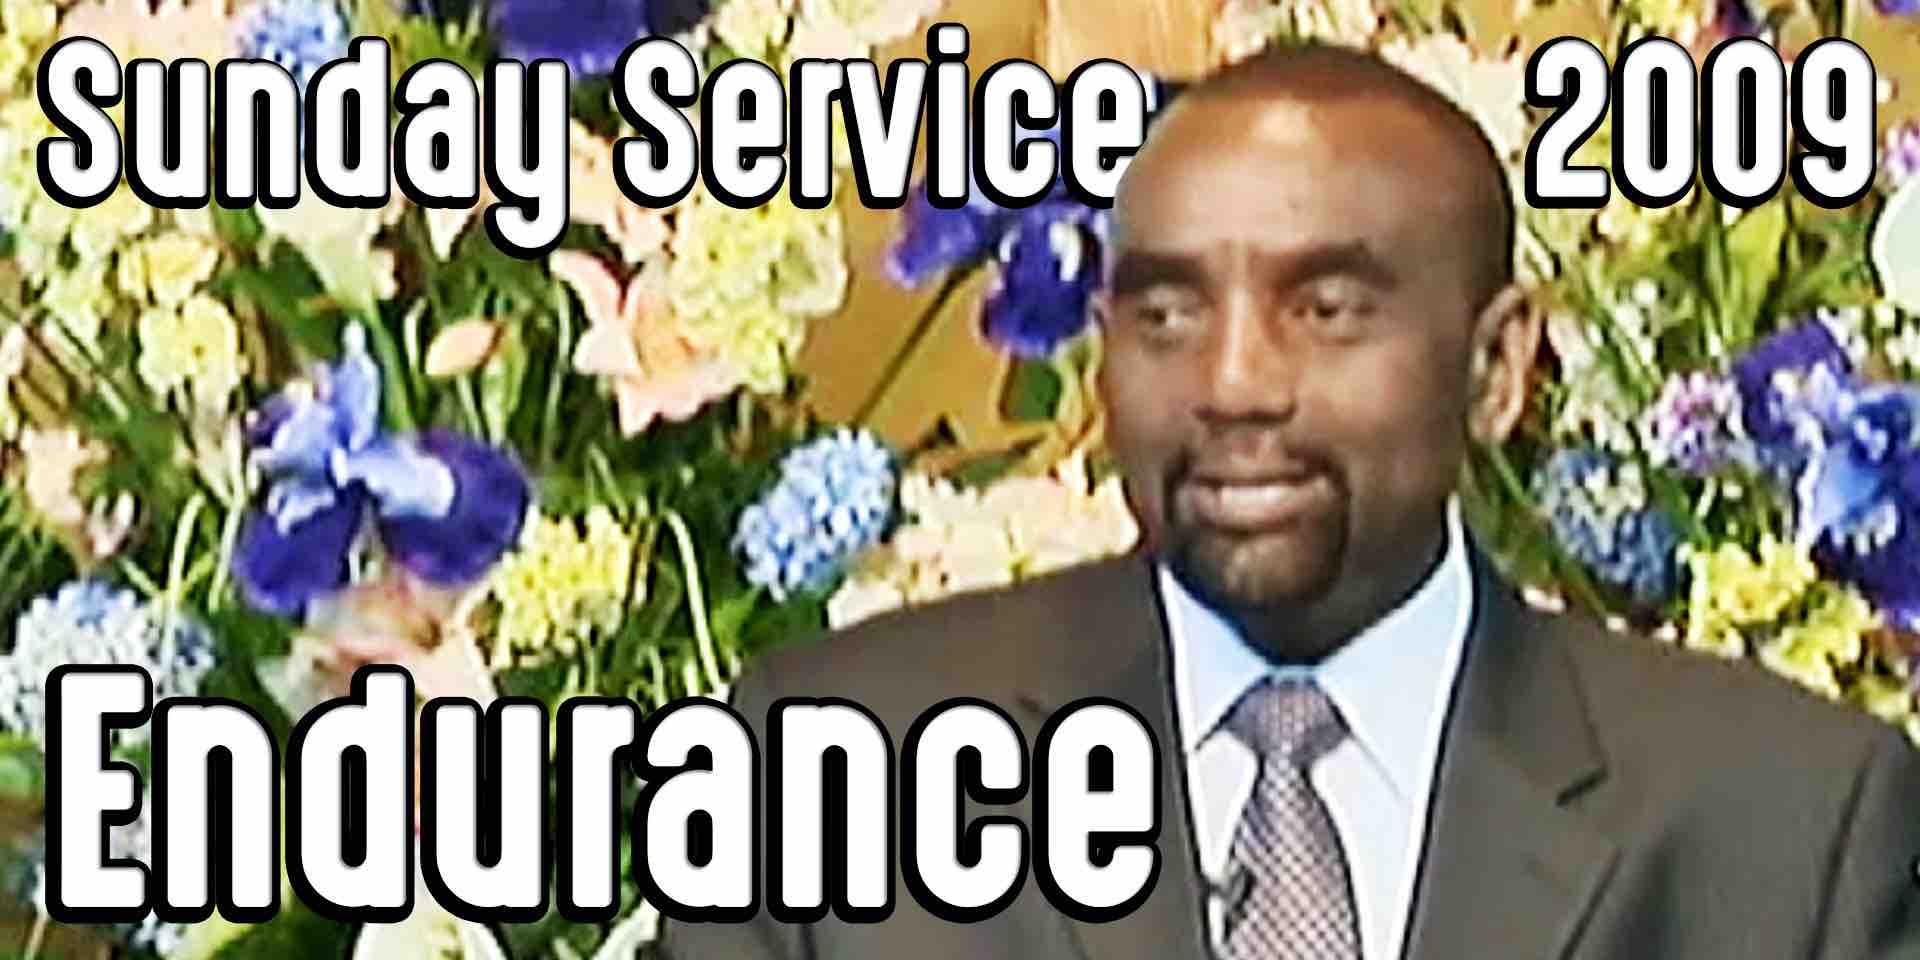 Endurance (Sunday Service 9/27/09)